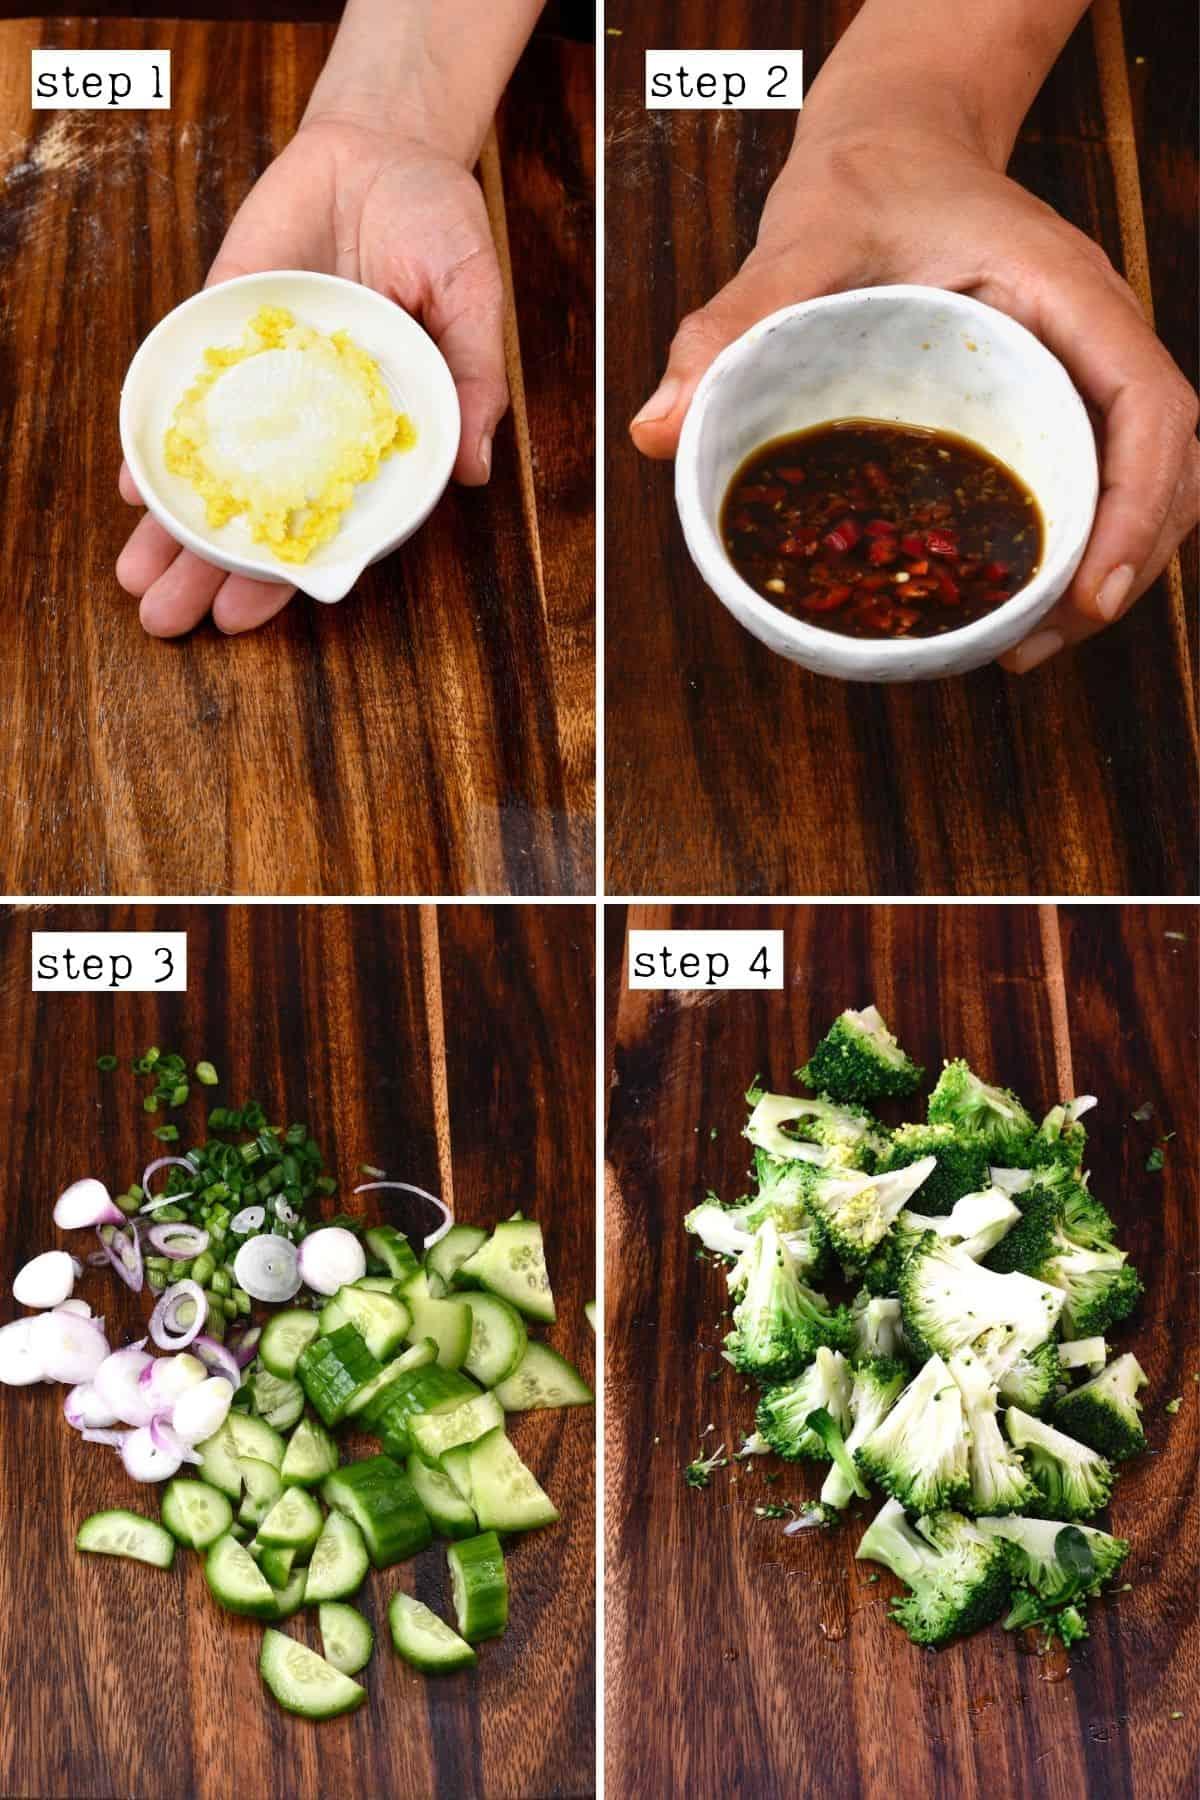 Steps for preparing Asian broccoli salad